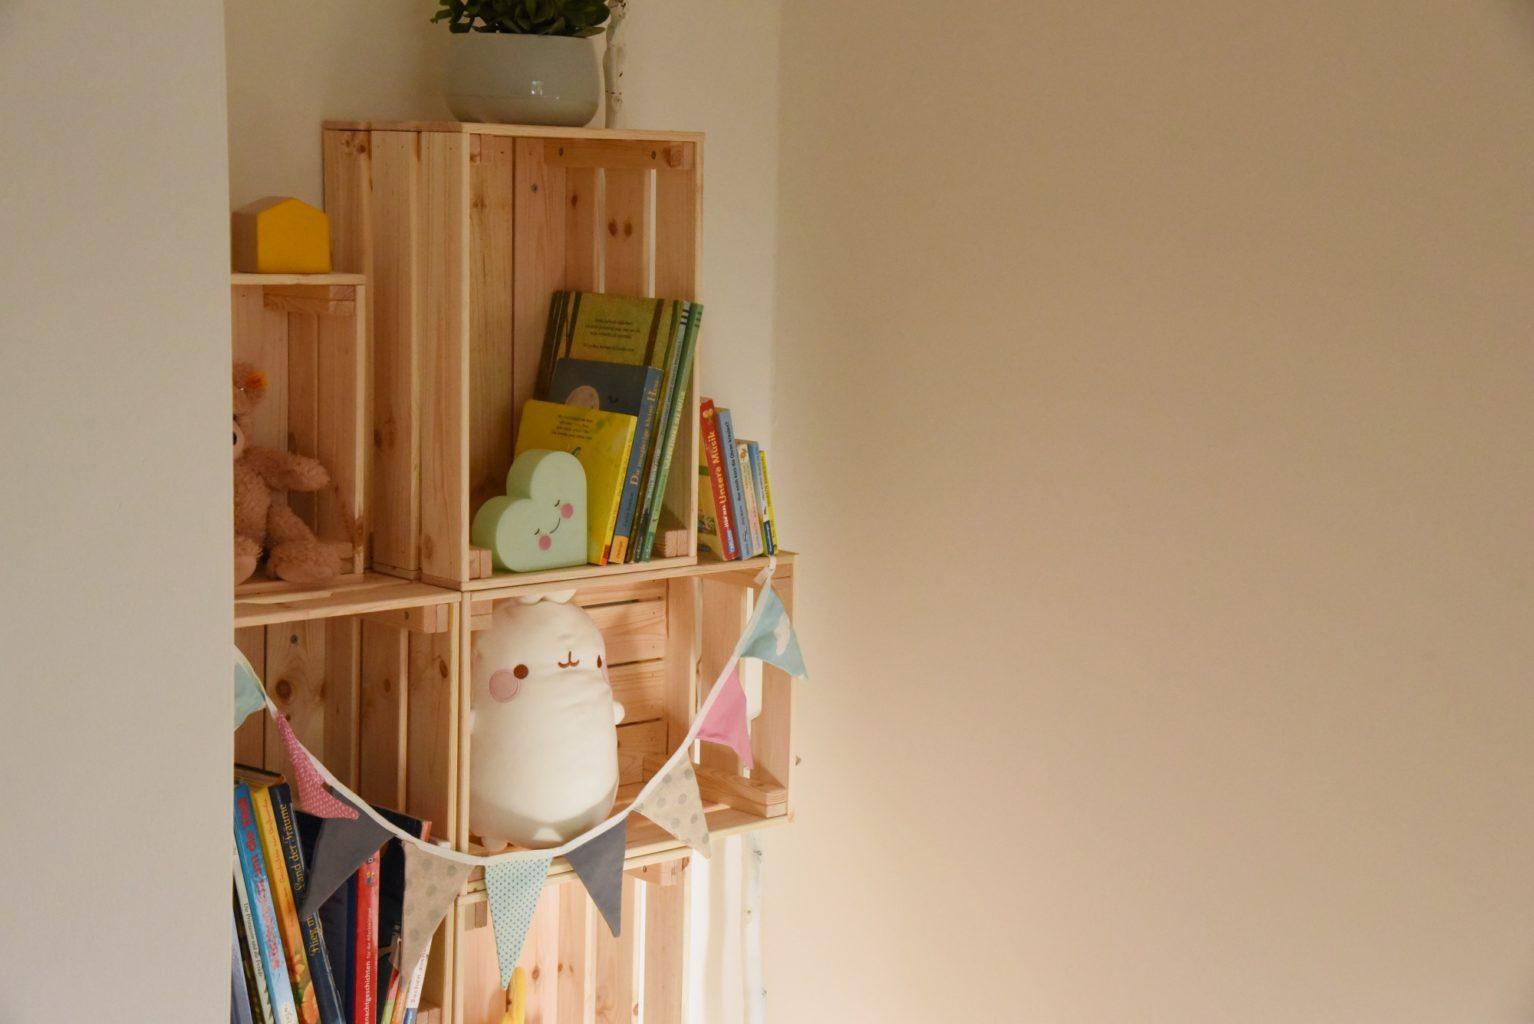 Full Size of Bücherregal Kinderzimmer Diy Regal Aus Holz Ikea Hack Mit Knagligg Regale Sofa Weiß Kinderzimmer Bücherregal Kinderzimmer